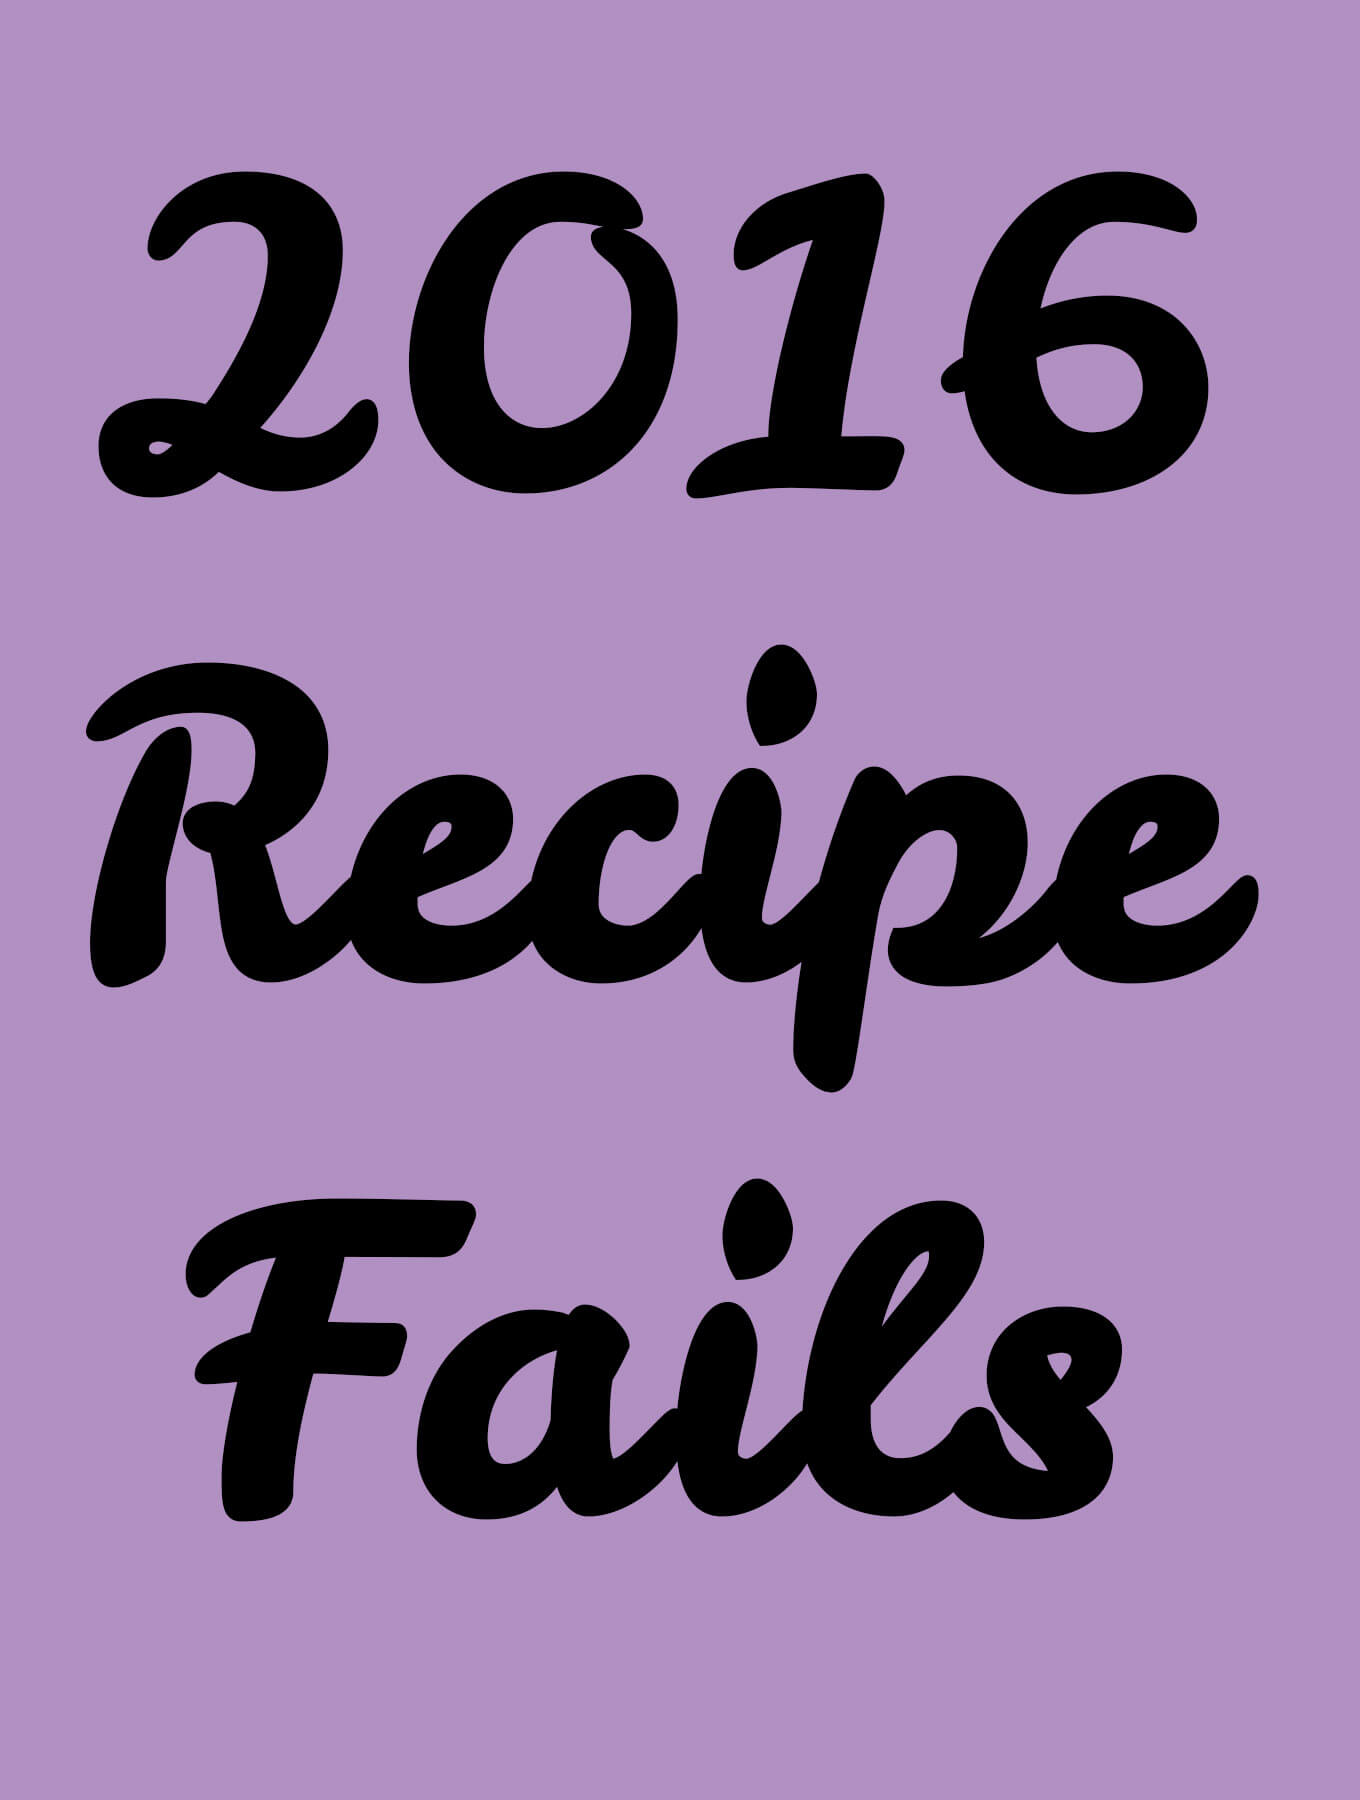 2016 Recipe Fails!